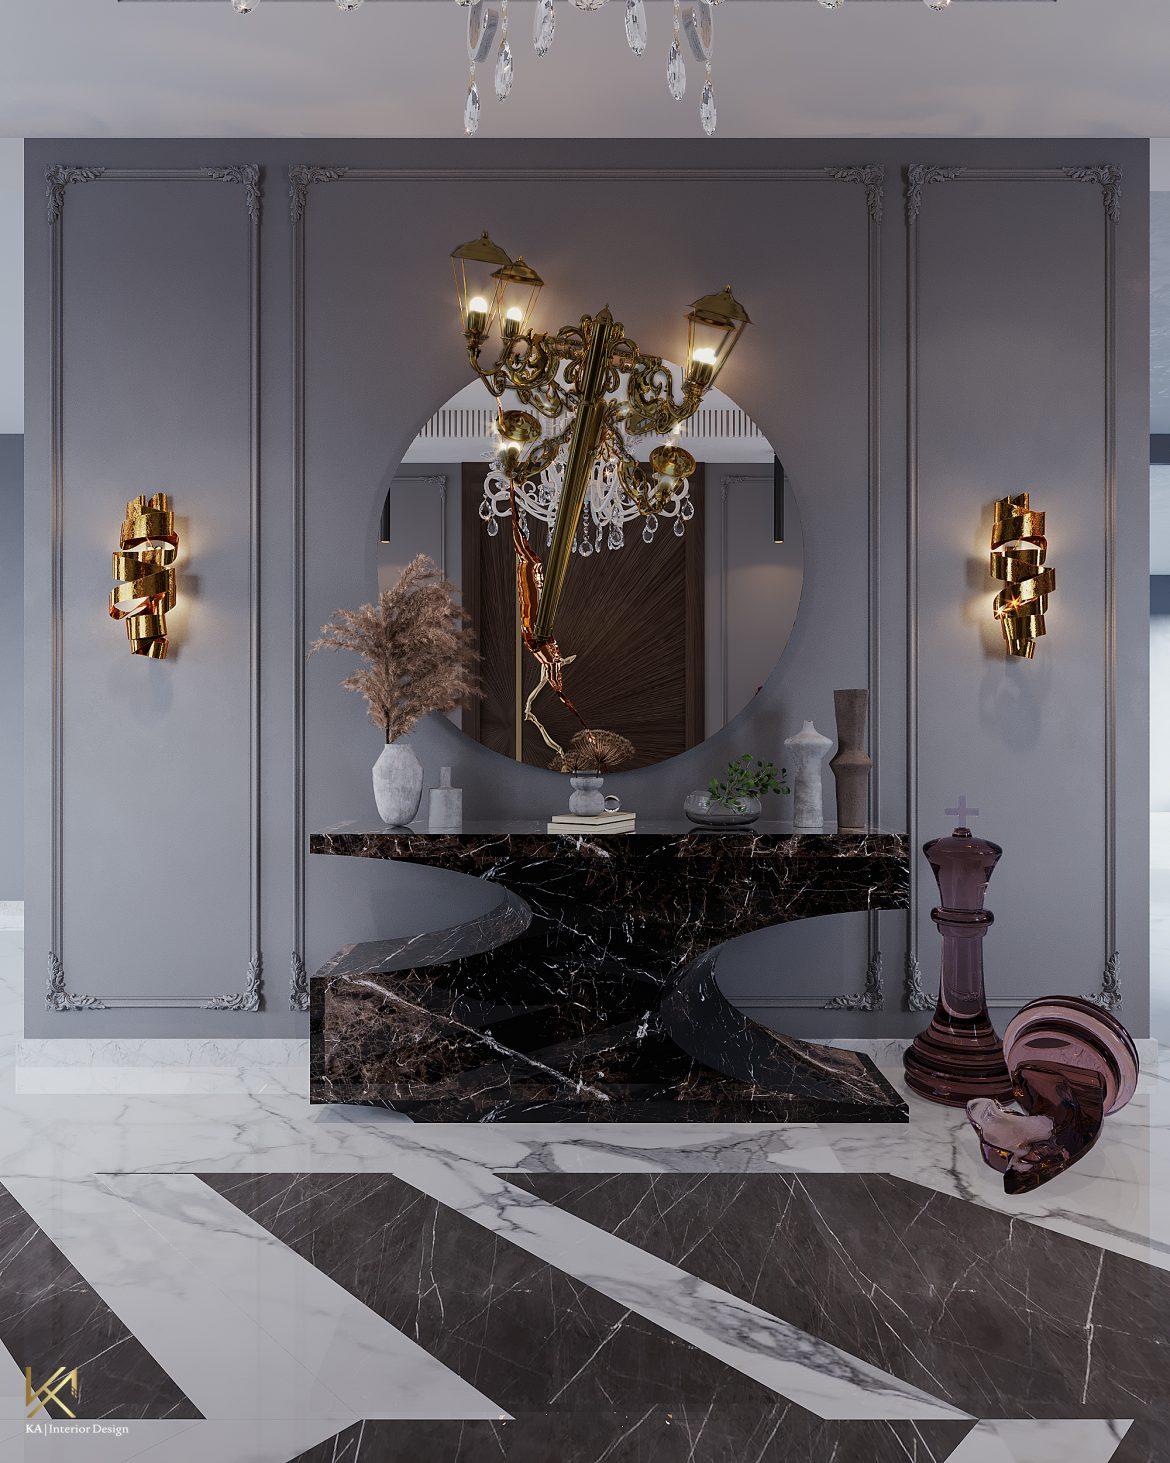 Covet House x K.A Interior Design: A Opulent Modern Classic Villa in Riyadh  Covet House x K.A Interior Design:  A Opulent Modern Classic Villa In Riyadh covet house k a interior design lavish modern classic villa riyadh 3